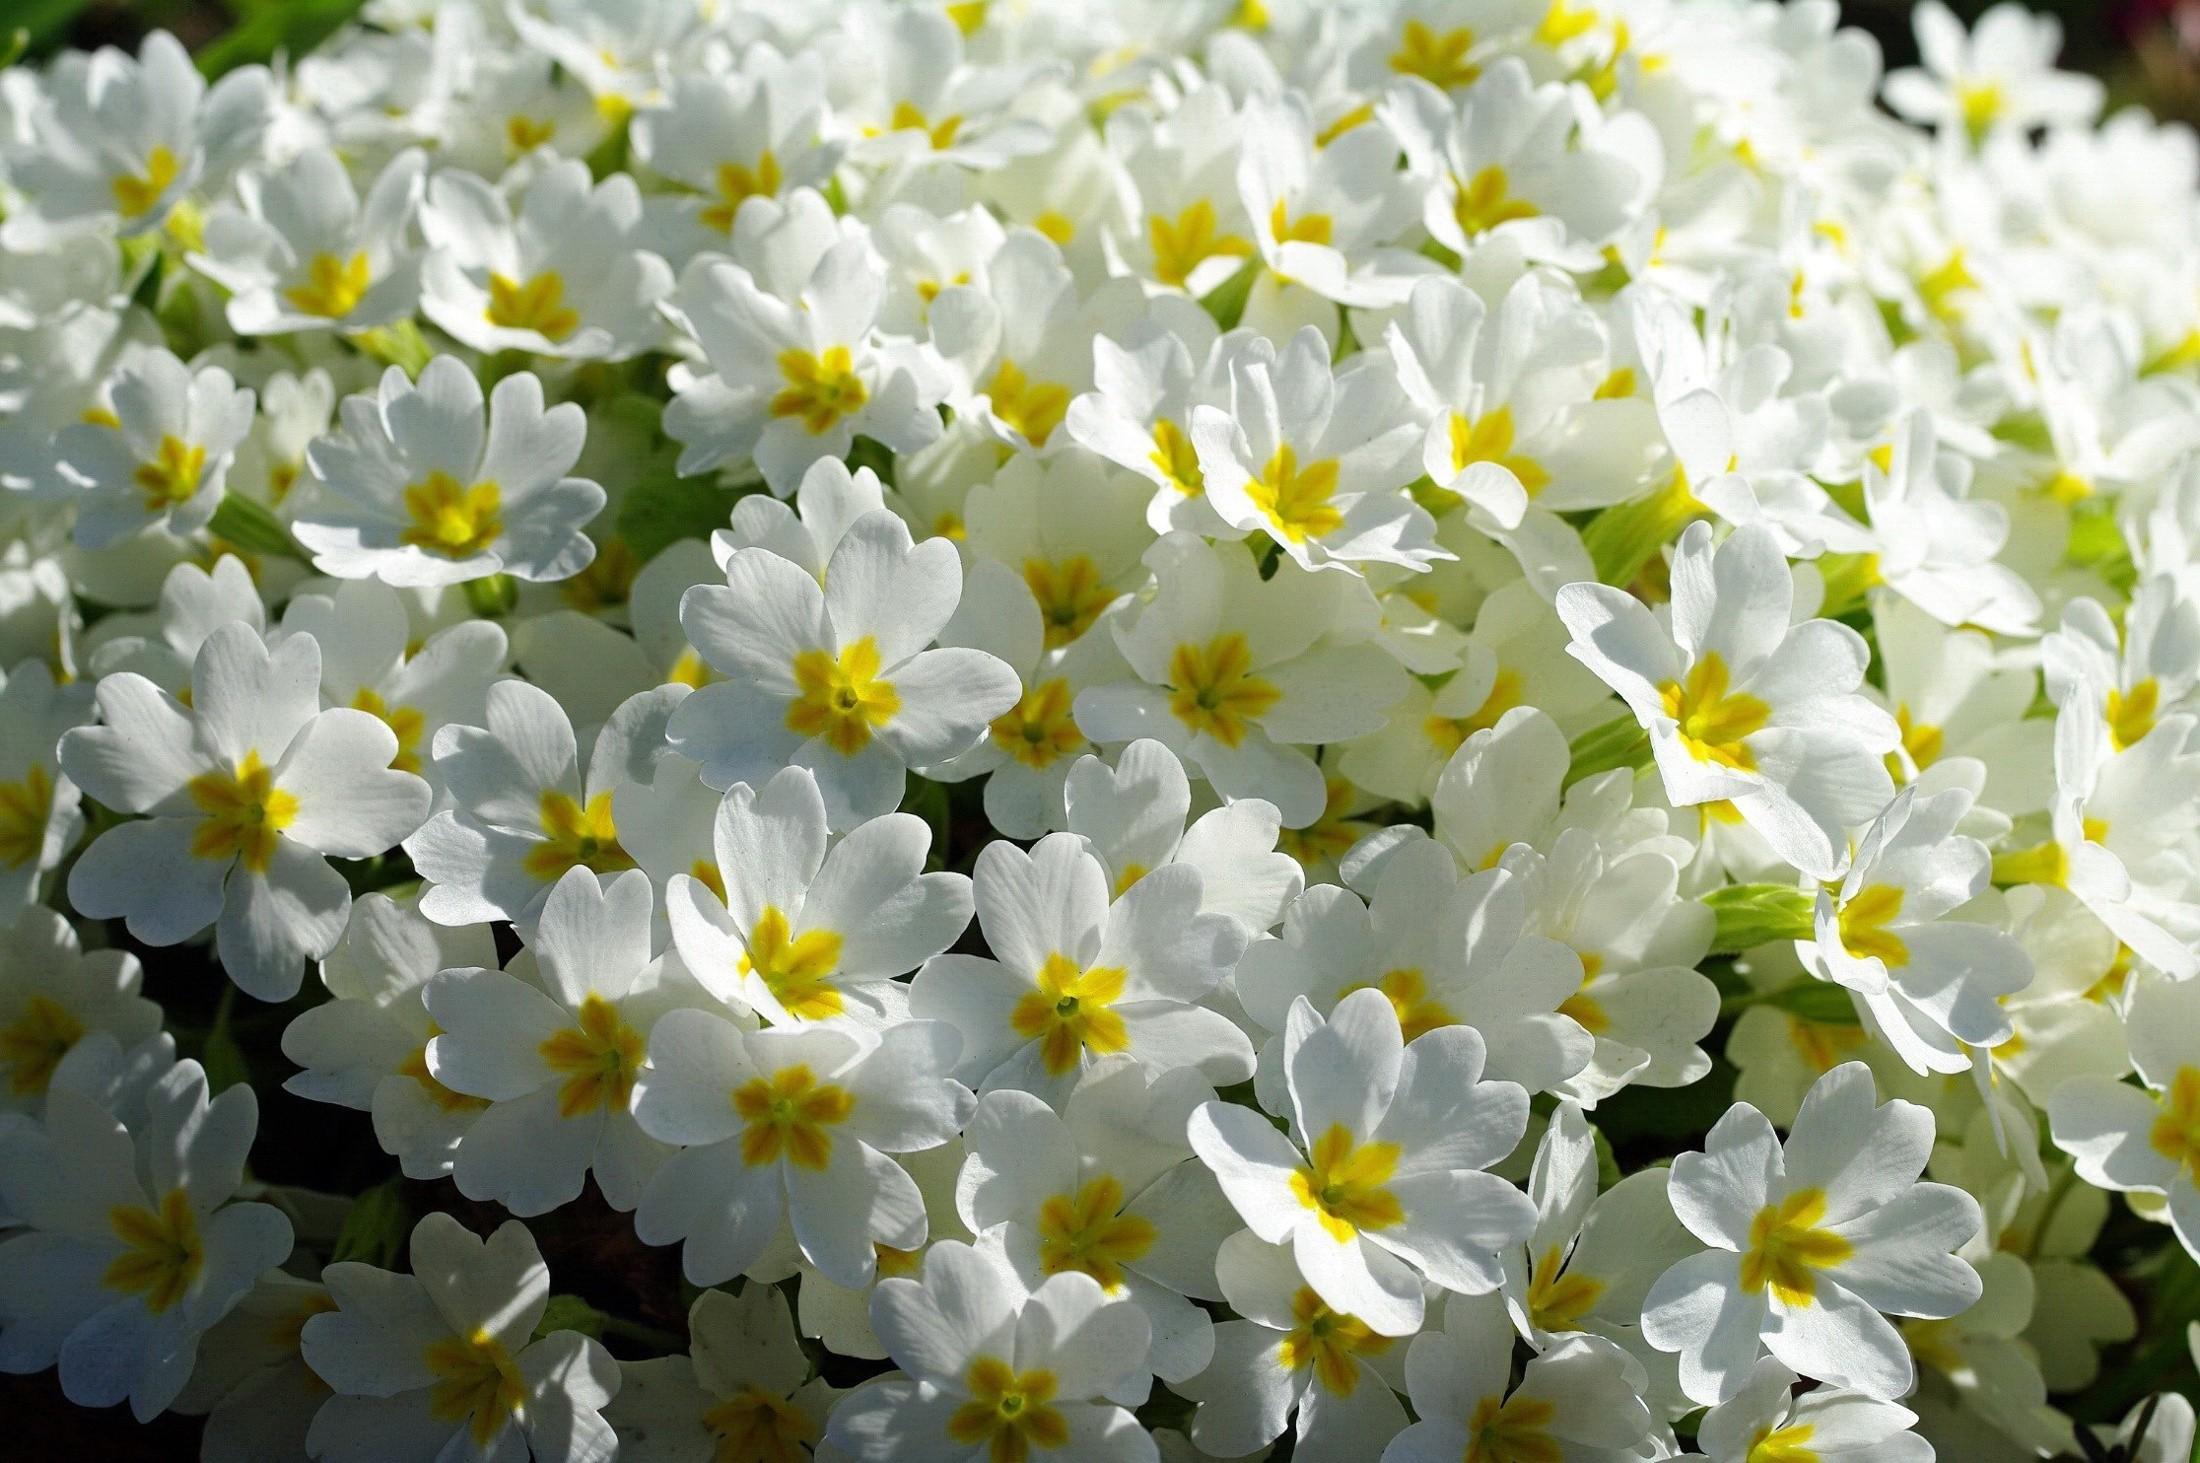 Wallpaper Nature Yellow Blossom Jasmine Flower Narcissus